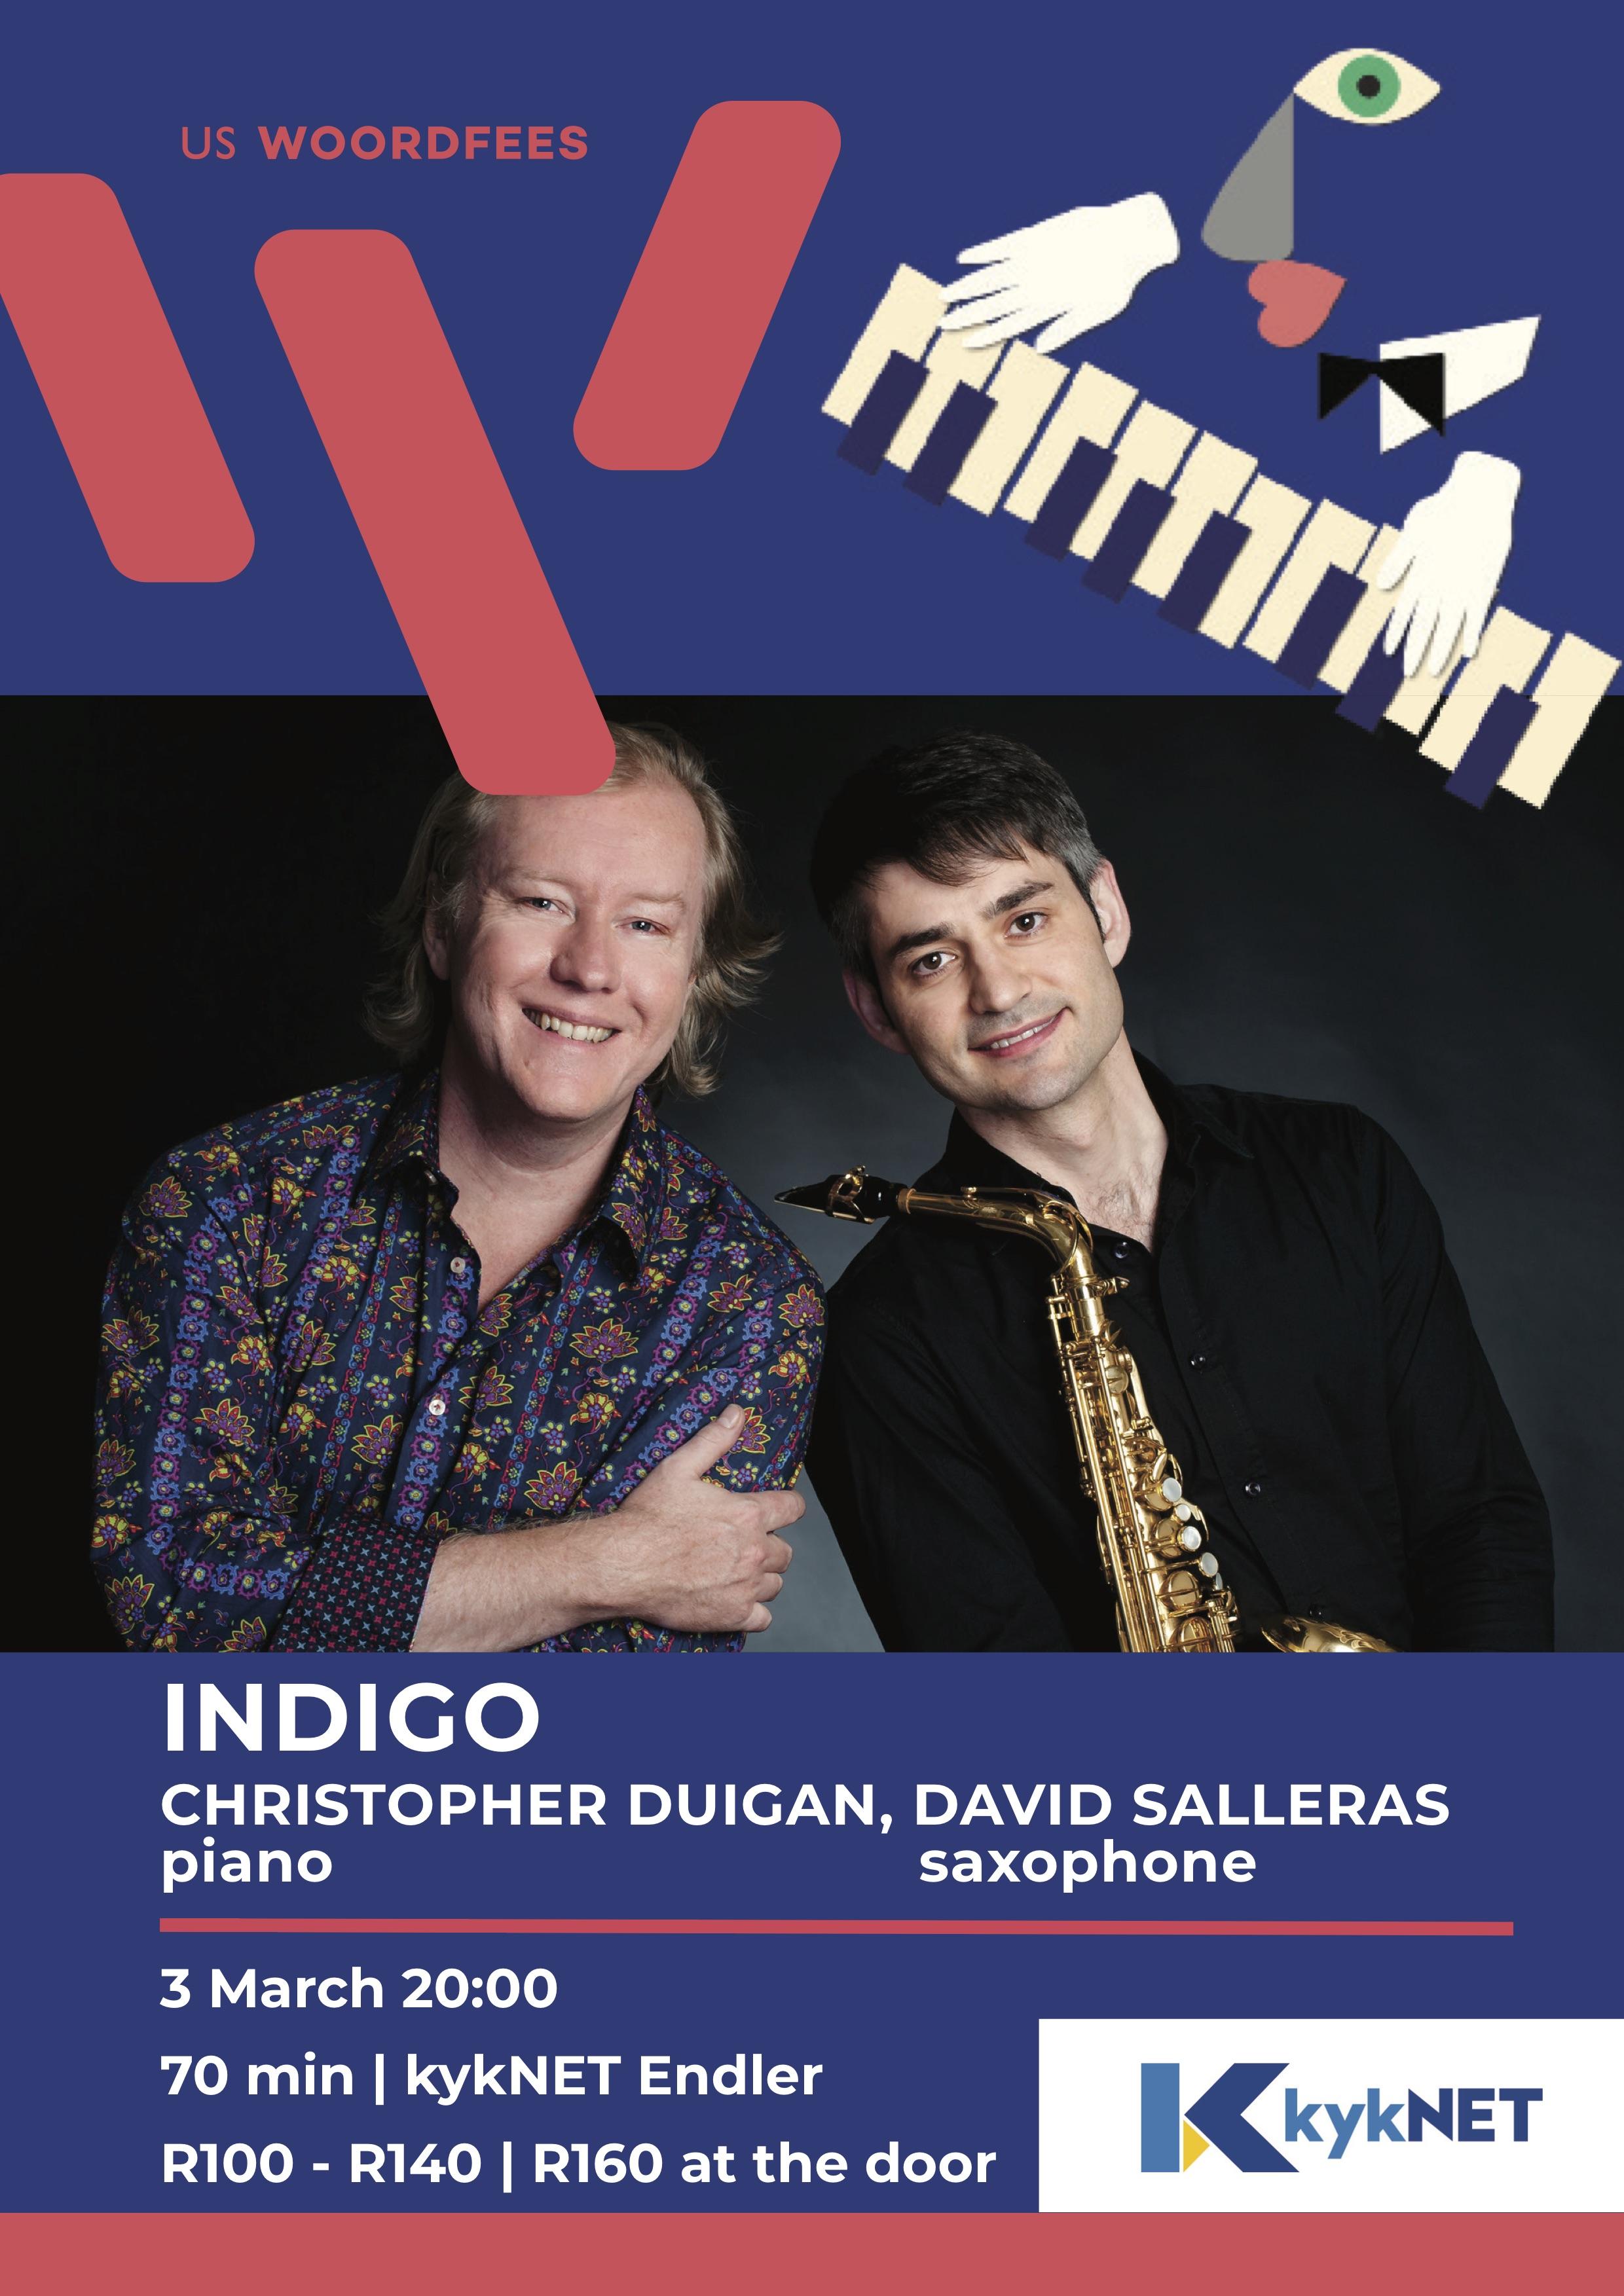 Indigo poster-1 copy.jpg